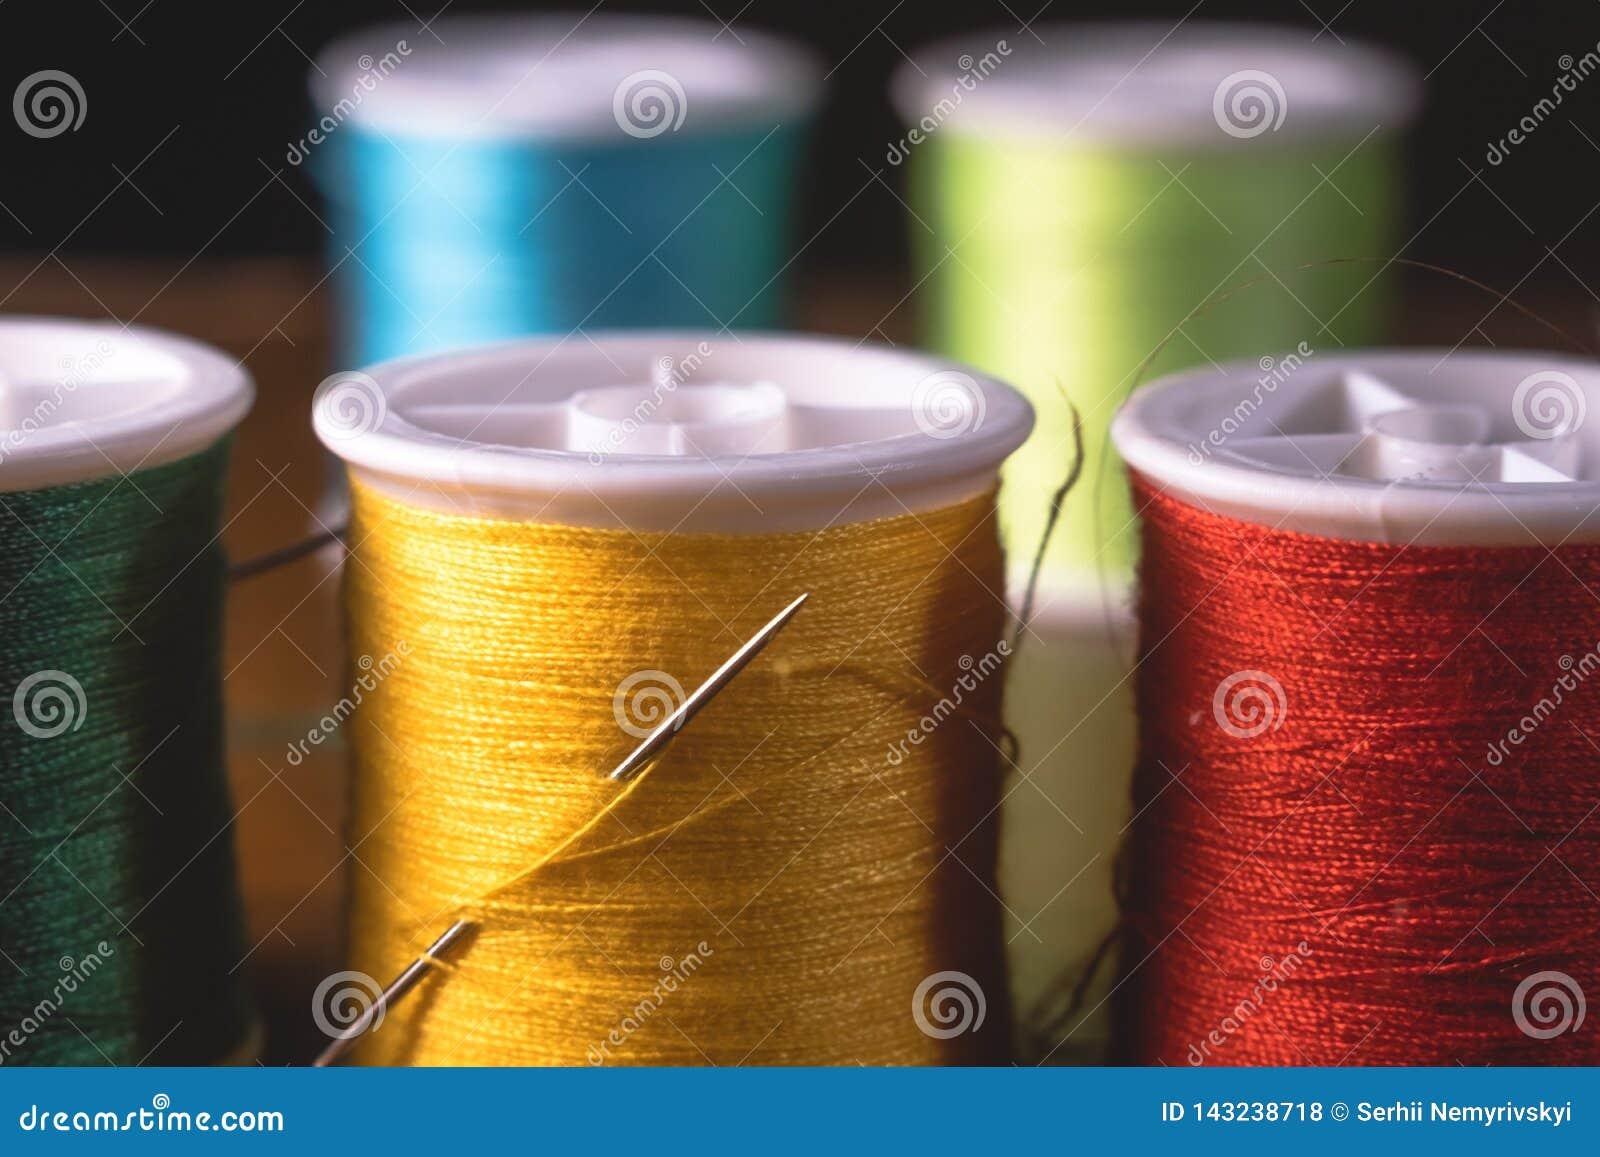 Unscharfe klare Farbfaden-Spulenspulen, industrieller nähender Konzeptentwurf